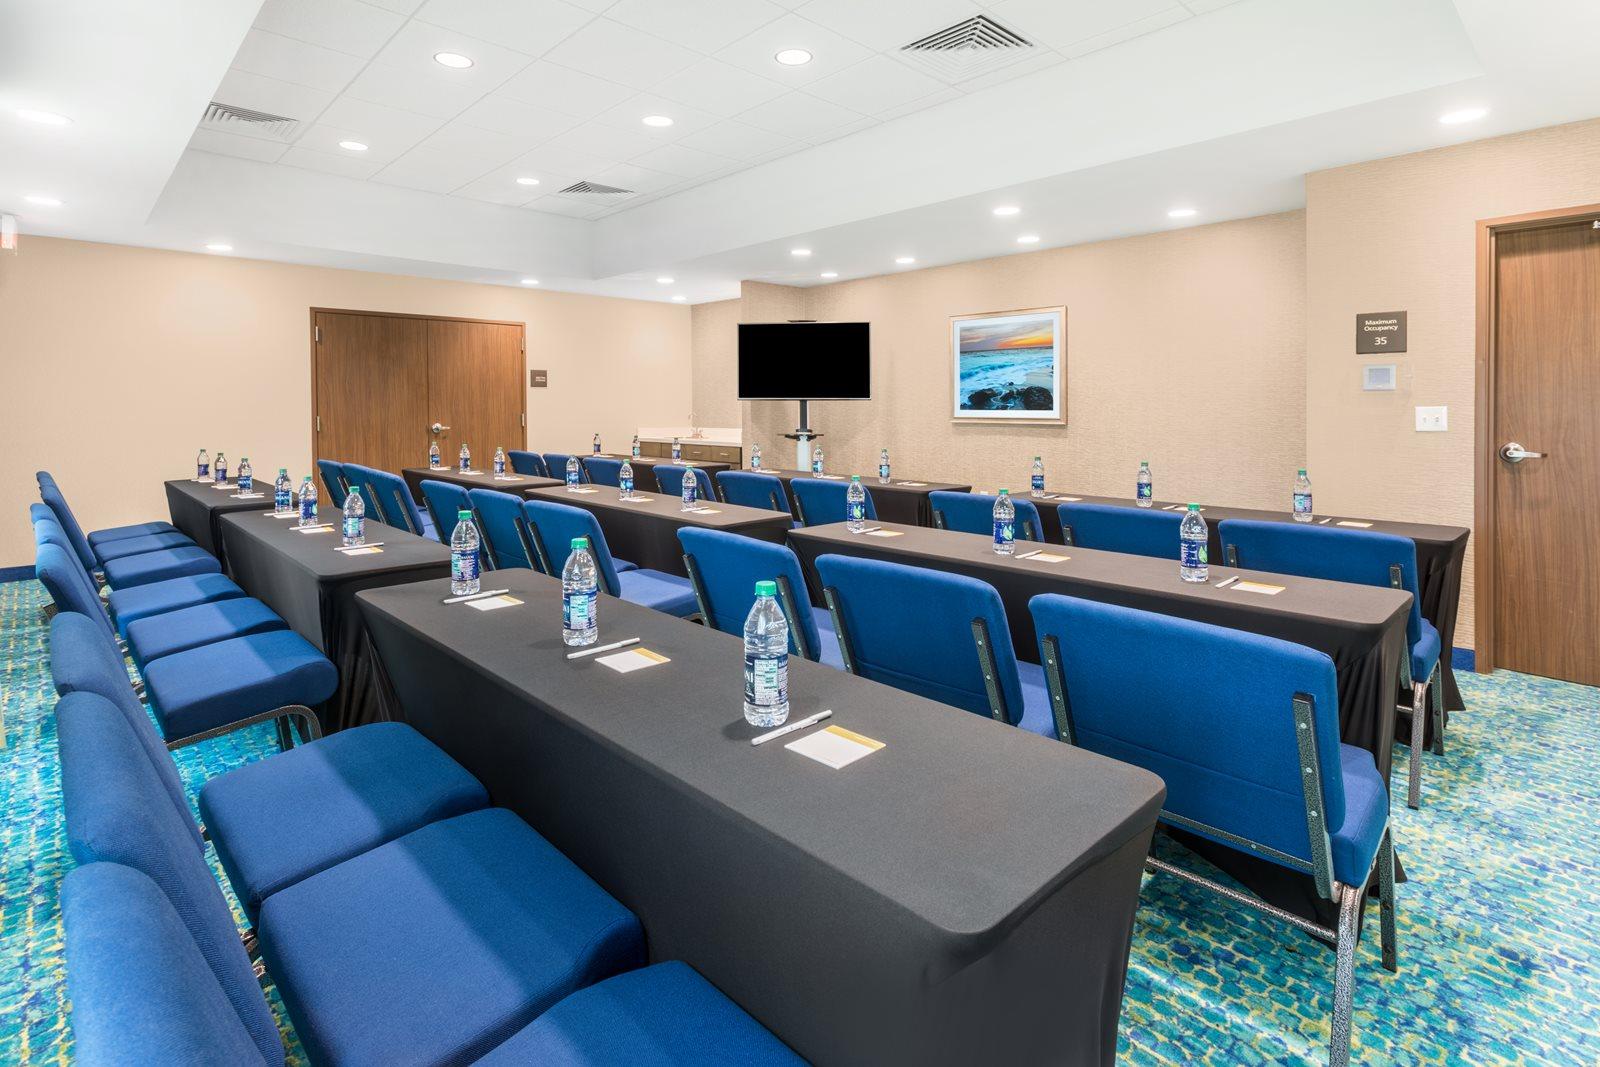 HamptonInn-MaryEstherFL-Meeting-Room.jpg